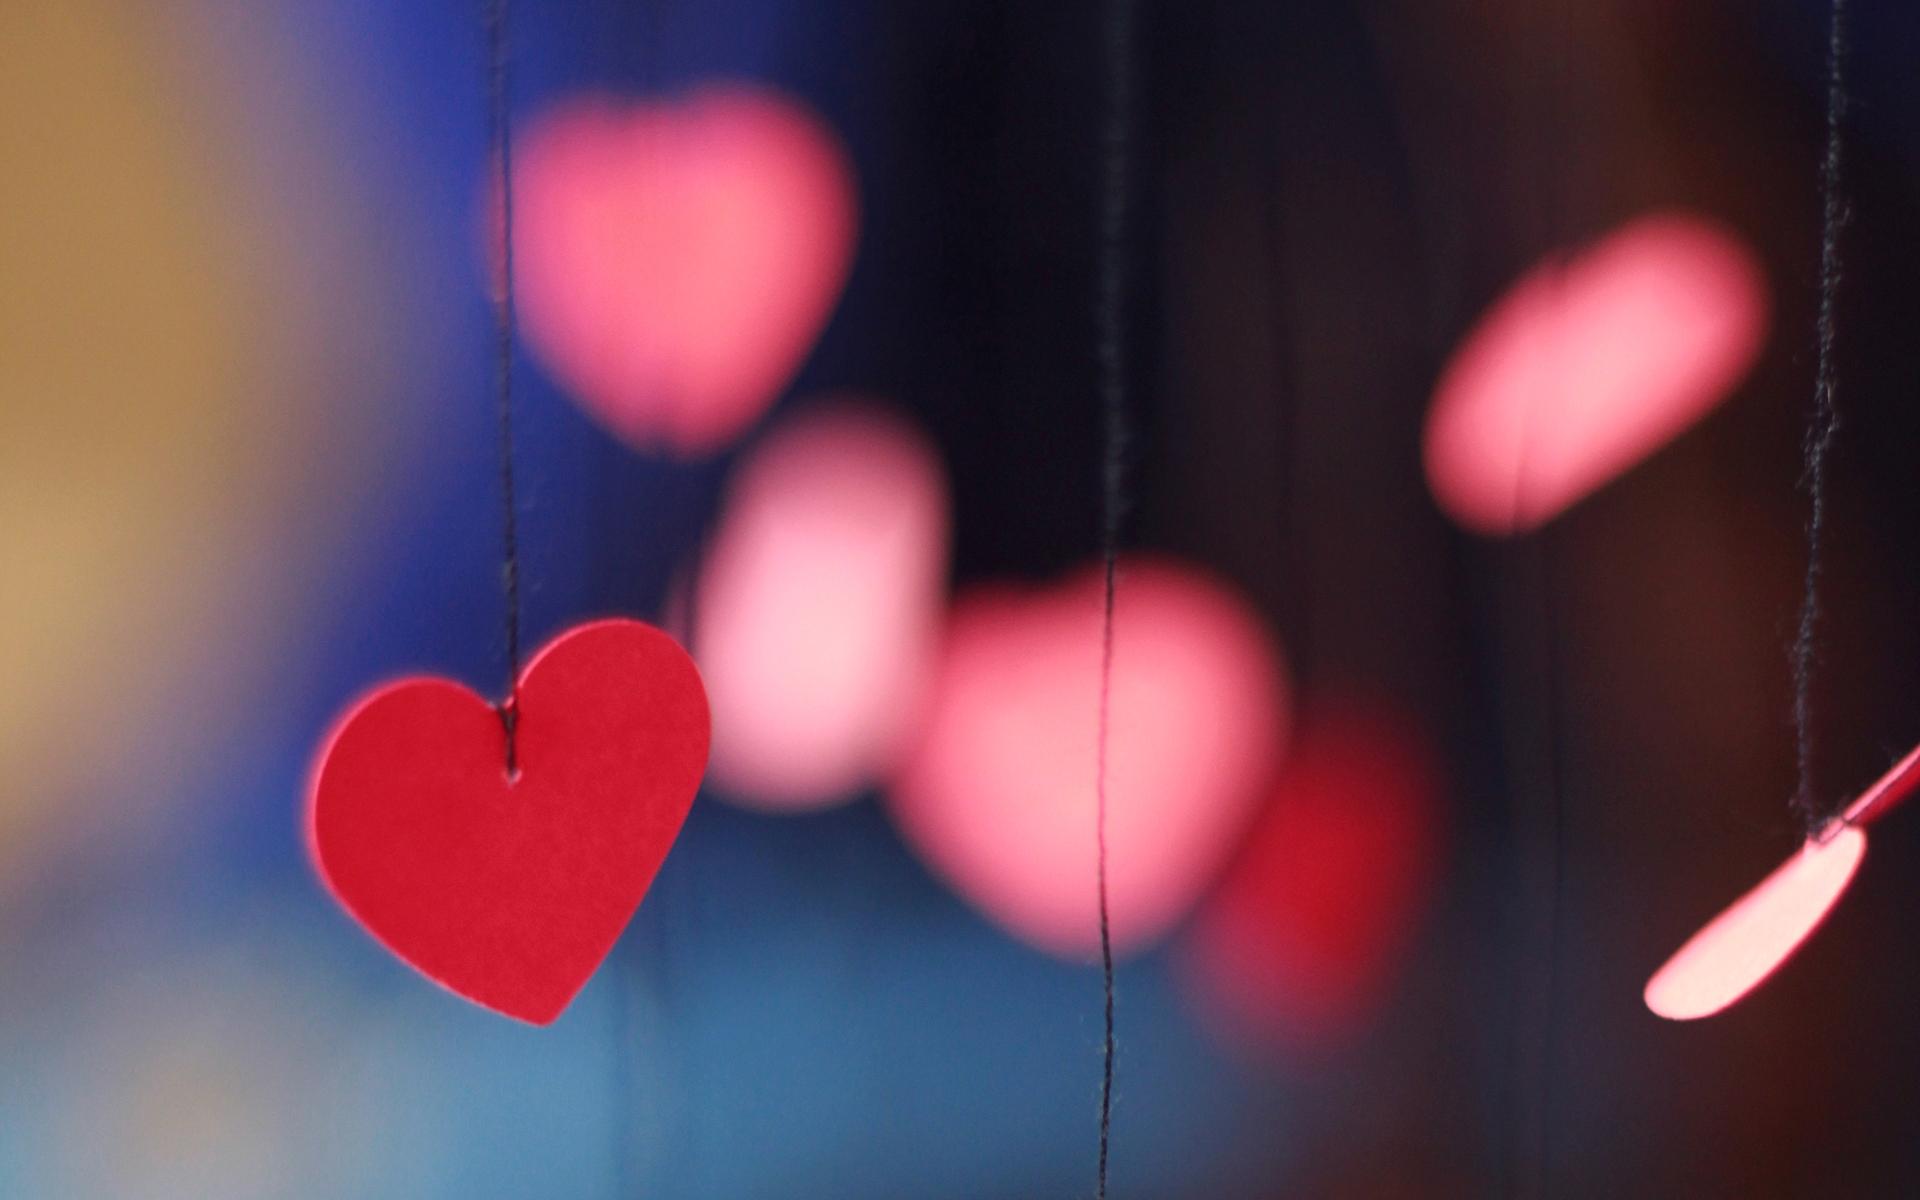 Обои сердце, шов, разбитое сердце, рисунок. Разное foto 9